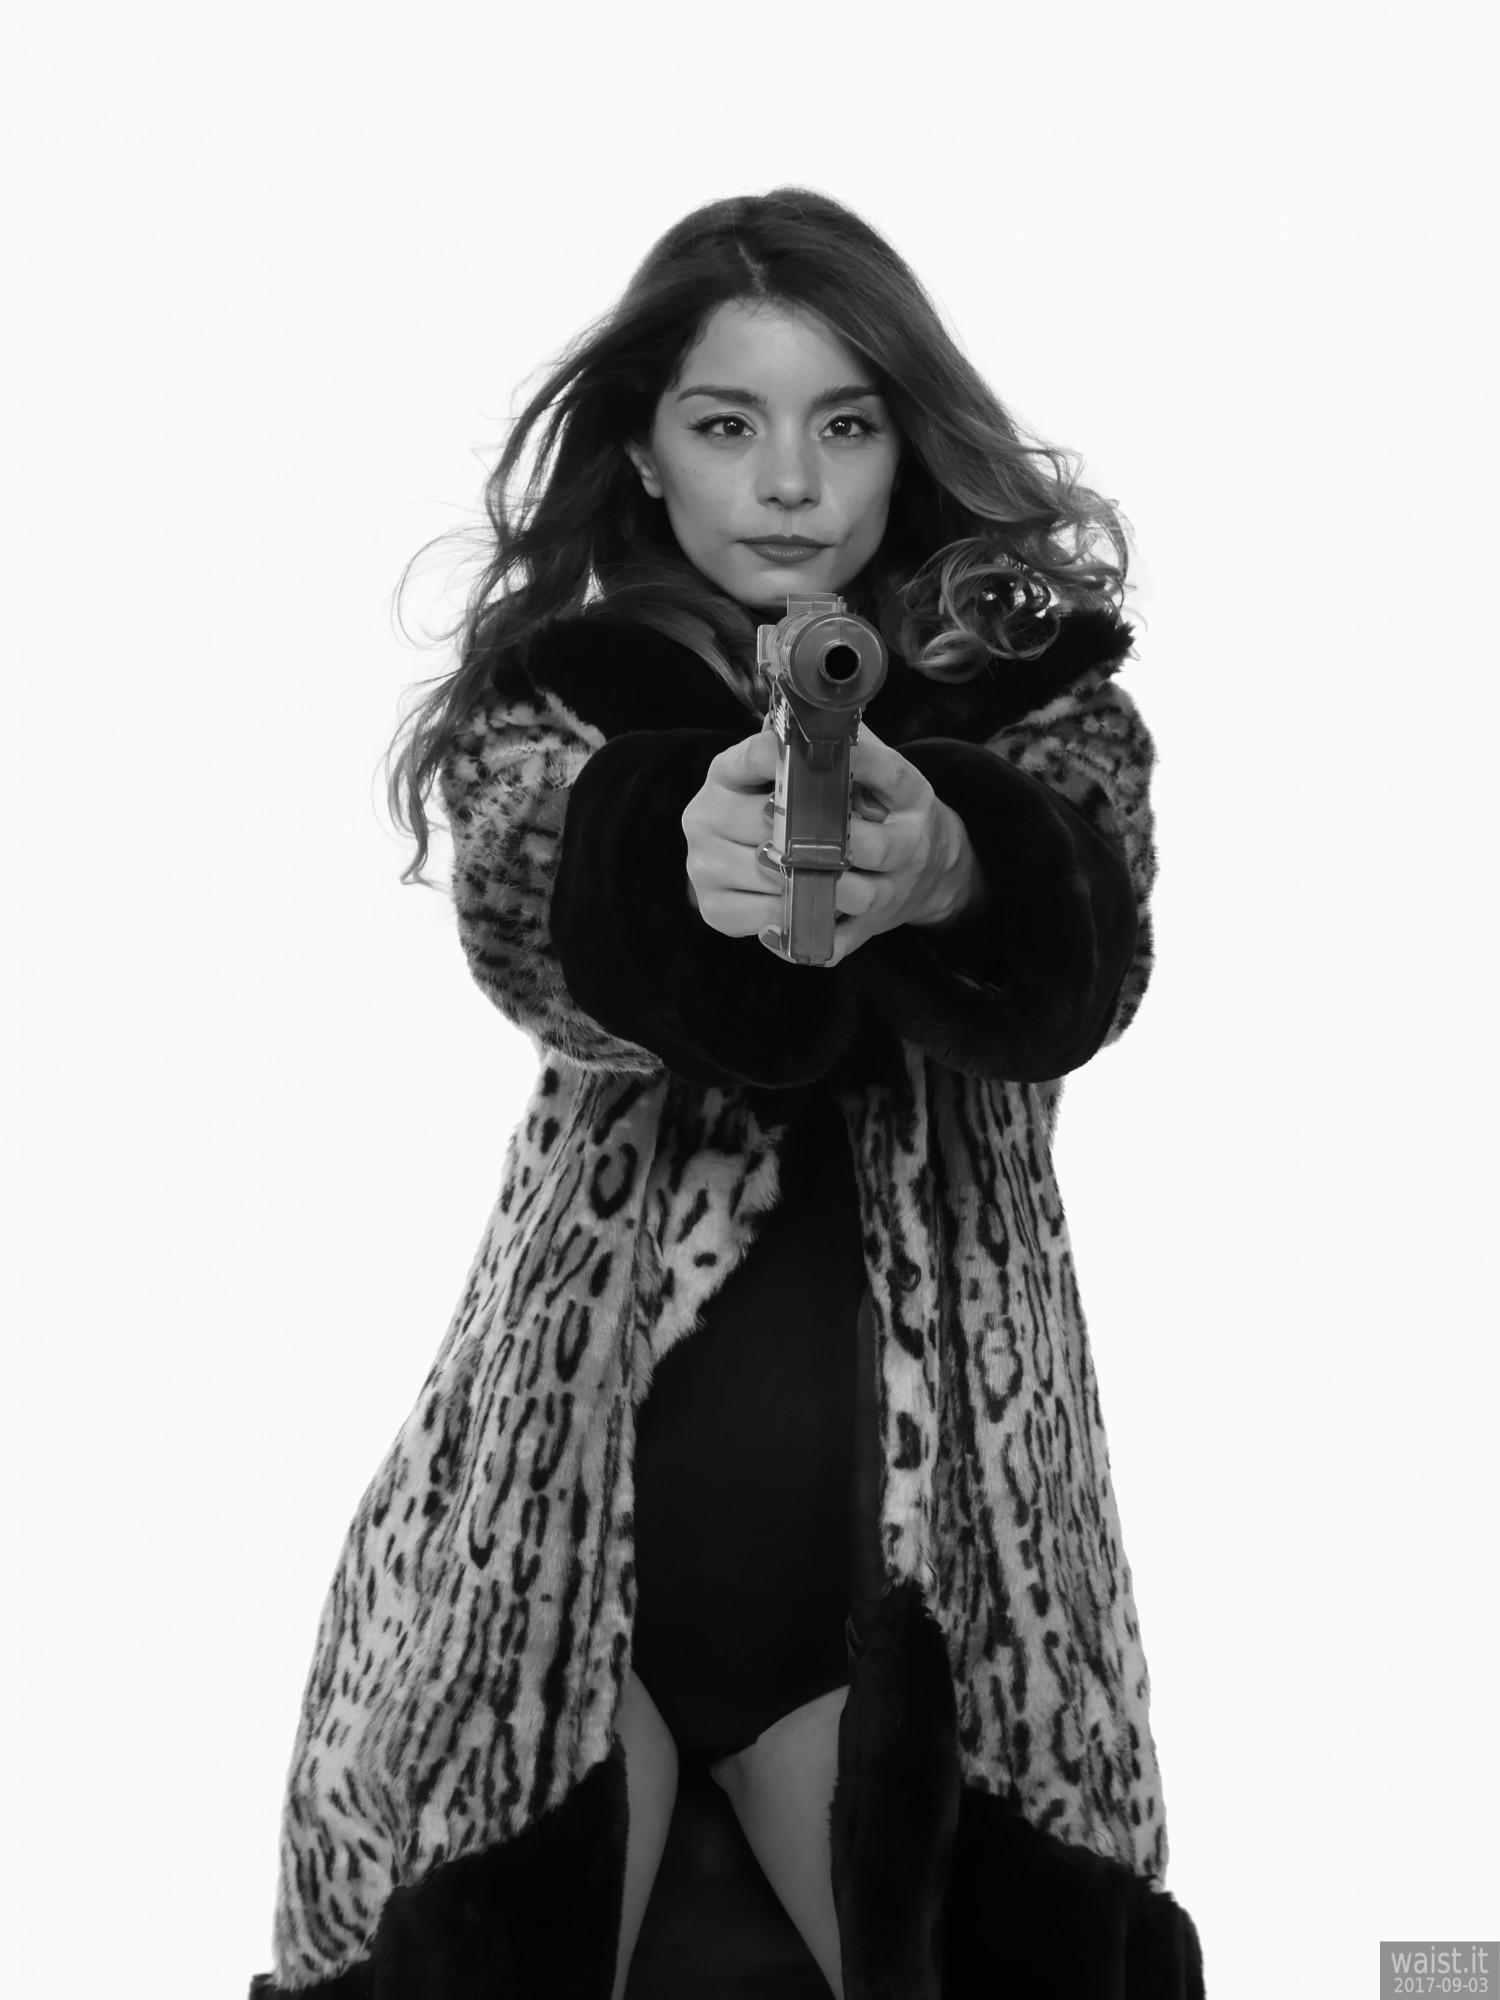 2017-09-03 Paula Soares in fur coat